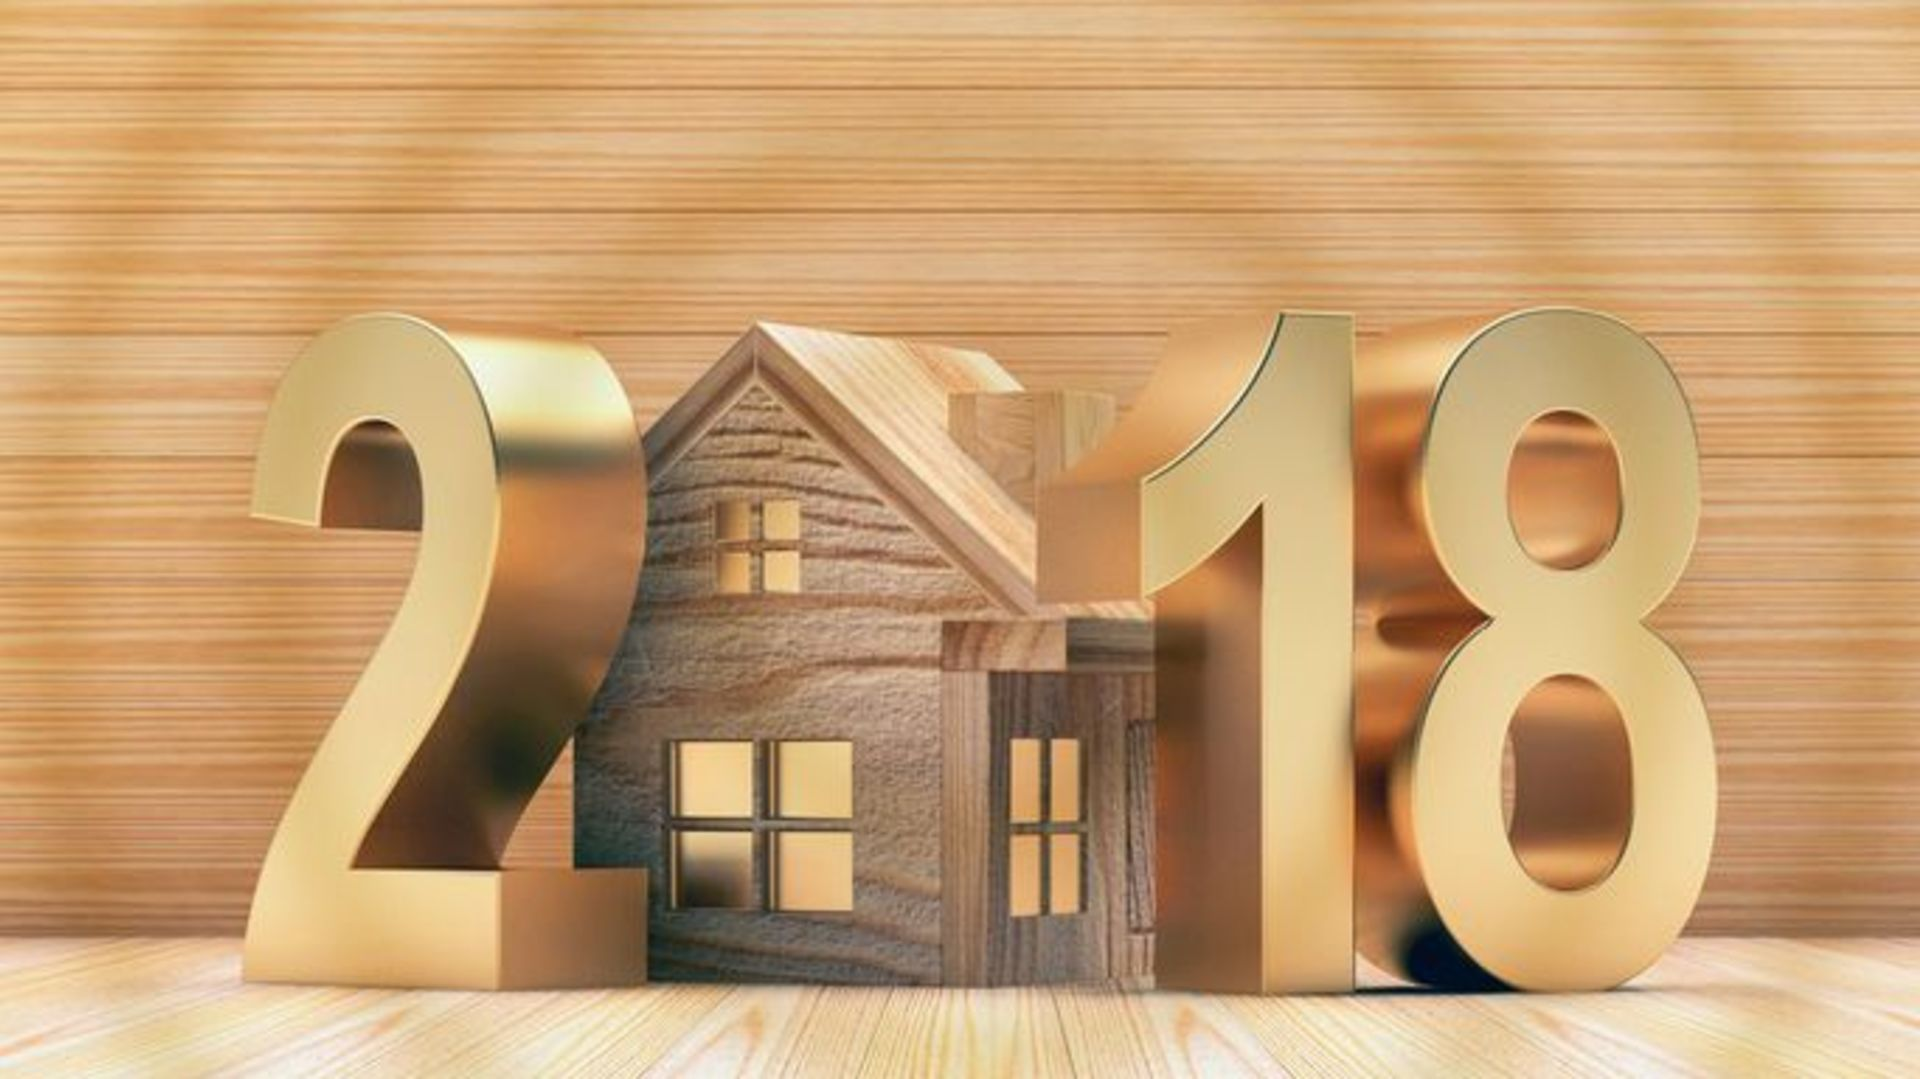 2018: The Year In Real Estate in Santa Clarita